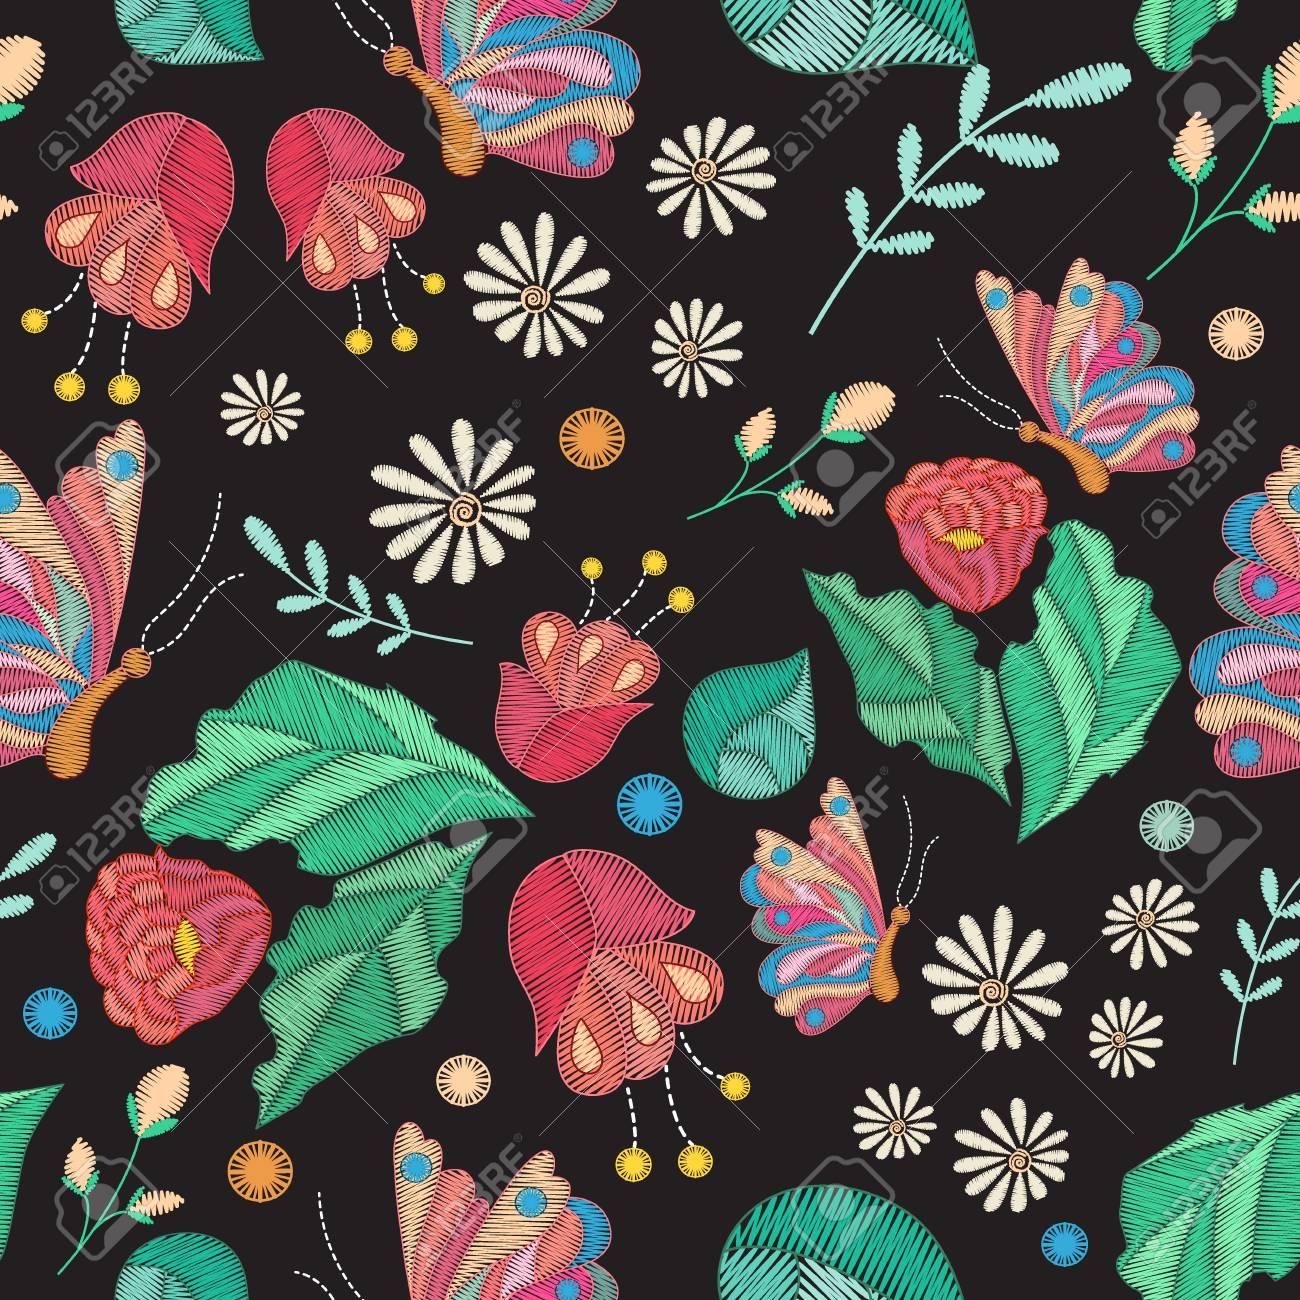 Vector Textura Perfecta Con Diseño De Bordado. Patrón Floral ...